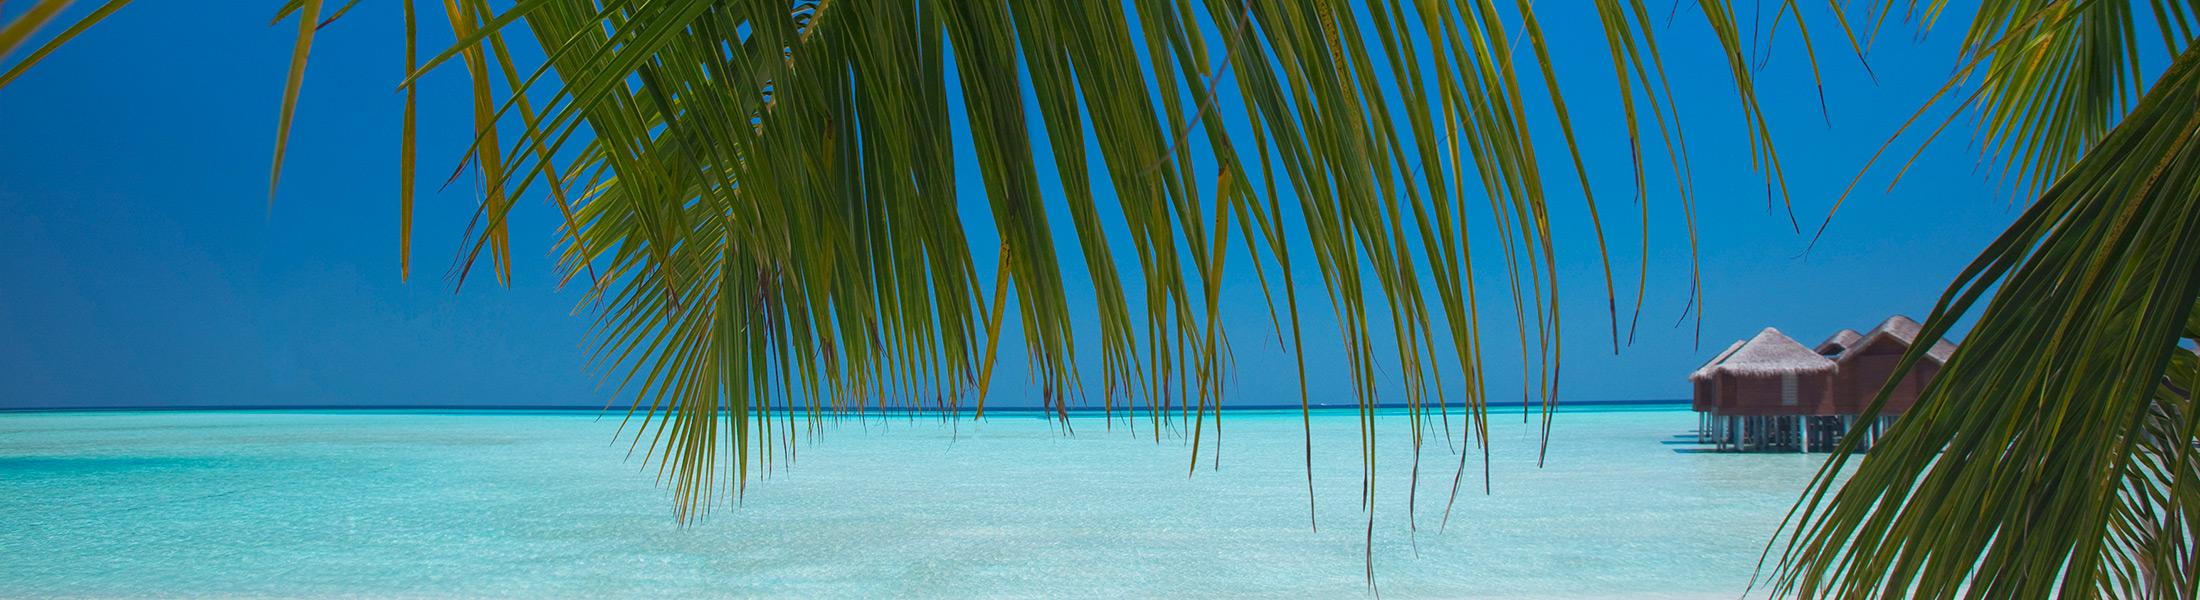 Over water villas seen through palms at Anantara Dhigu Resort